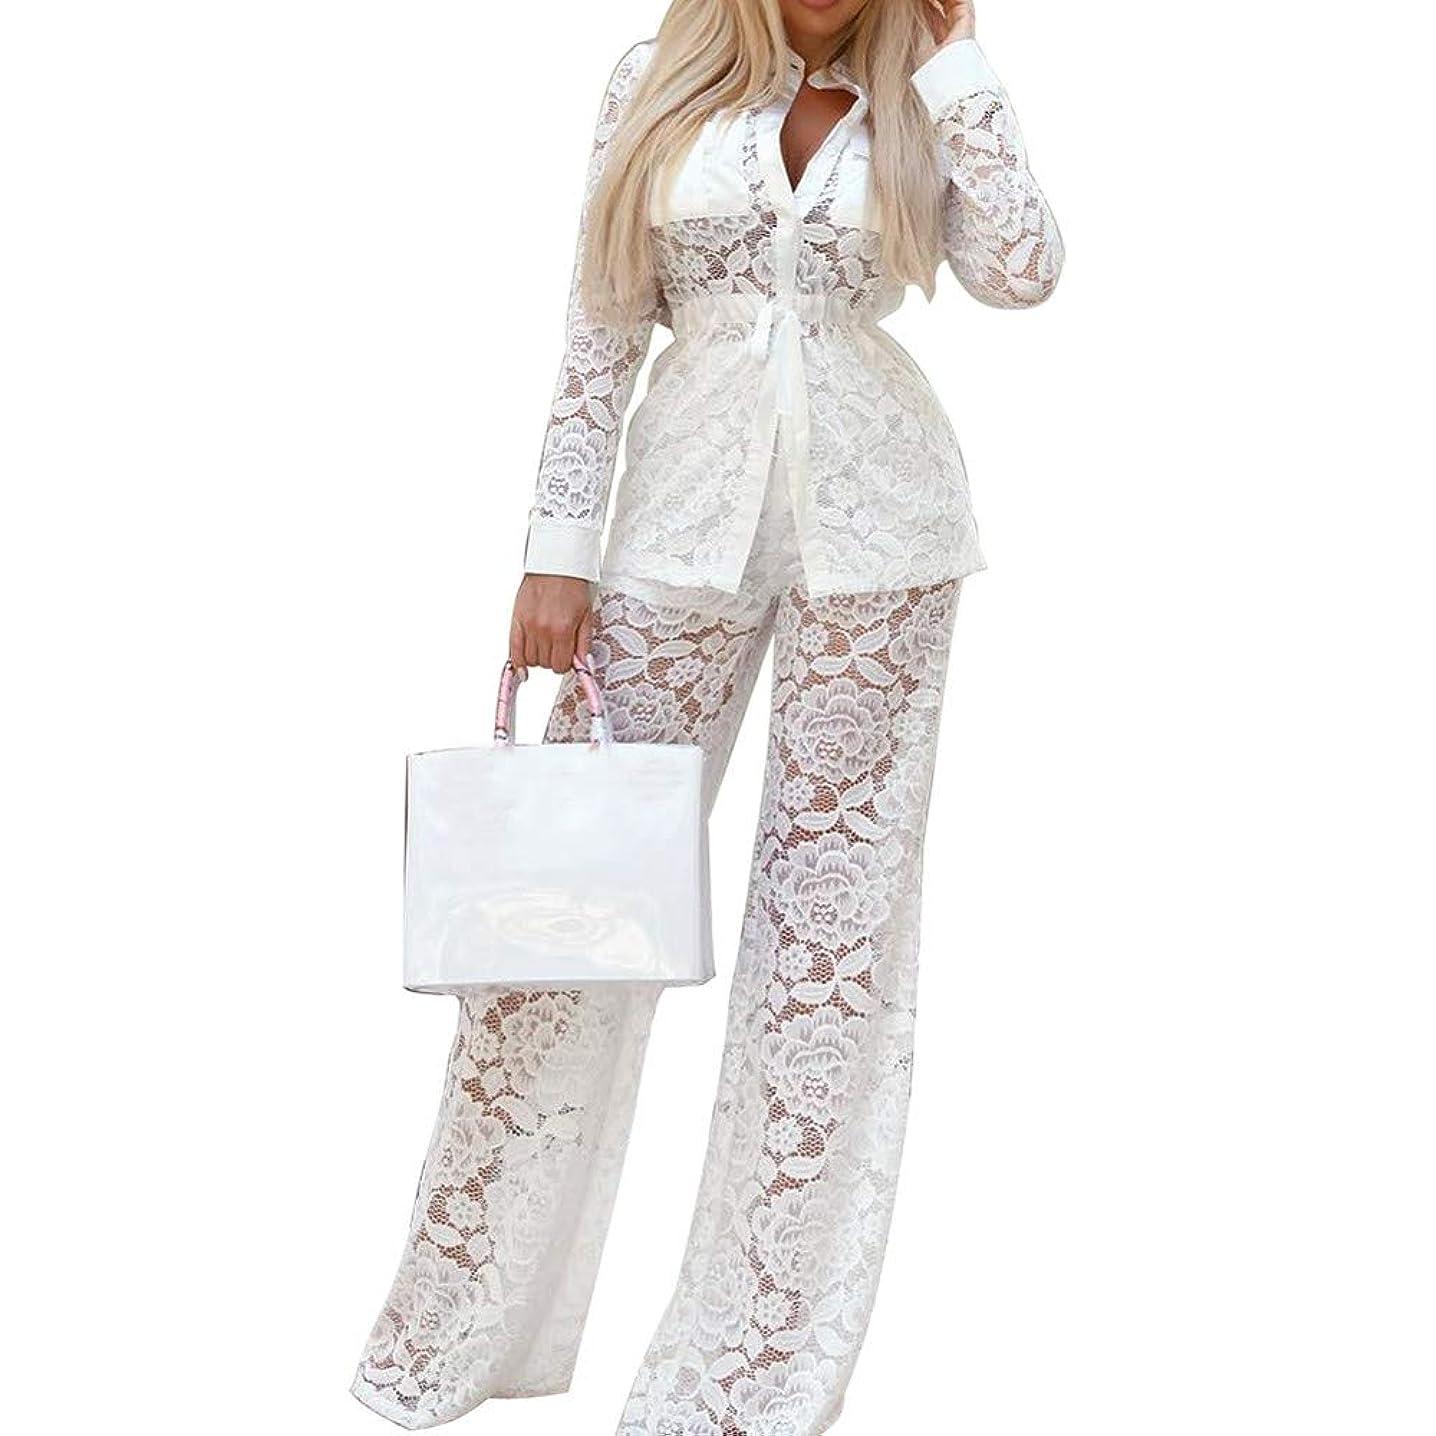 Dreamyth-sets 2Pcs Womens Long Sleeve Lace V-Neck Bandage Top Lace Loose Pants Suit